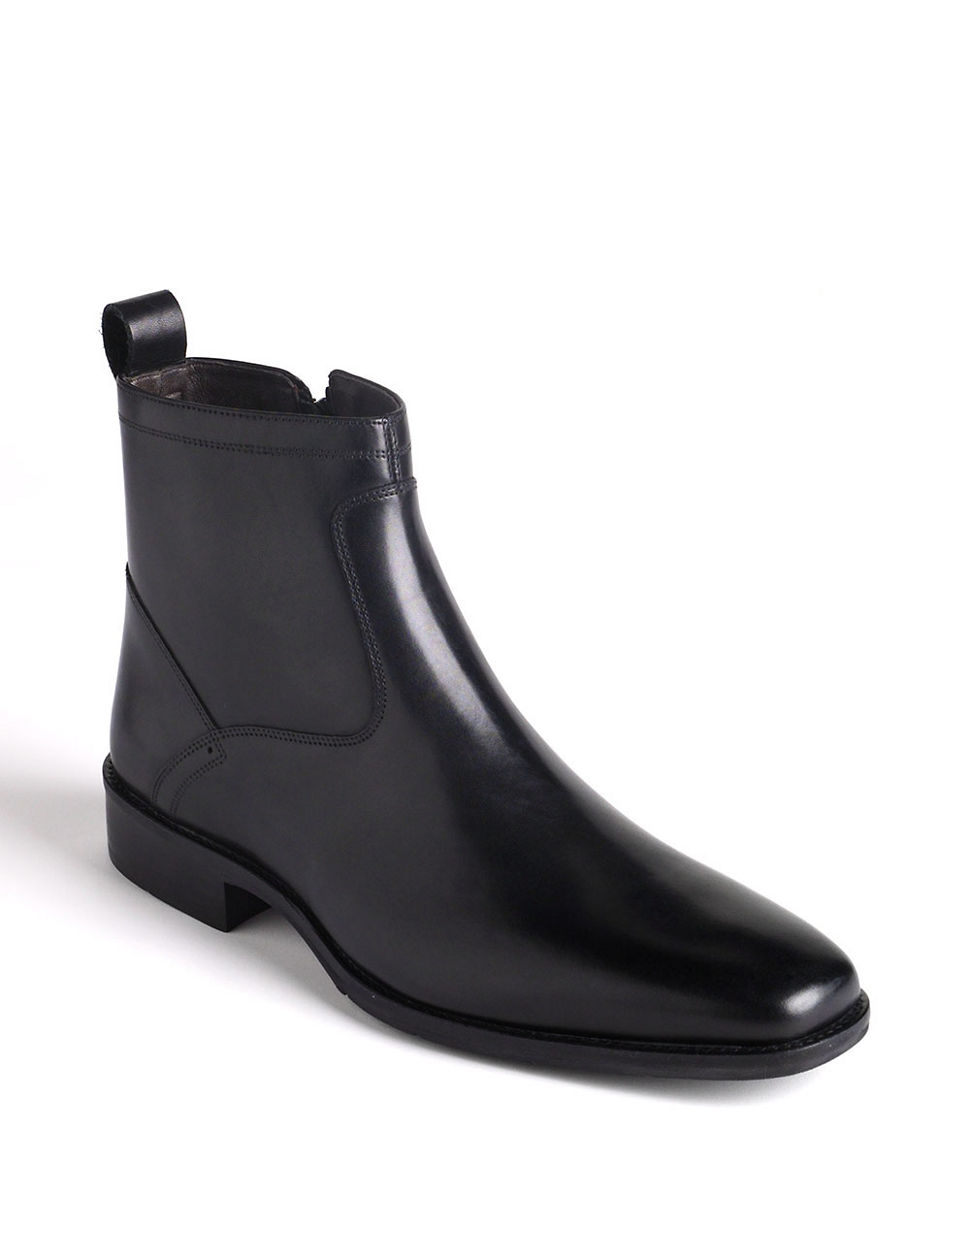 Johnston Amp Murphy Larsey Ankle Boots In Black For Men Lyst